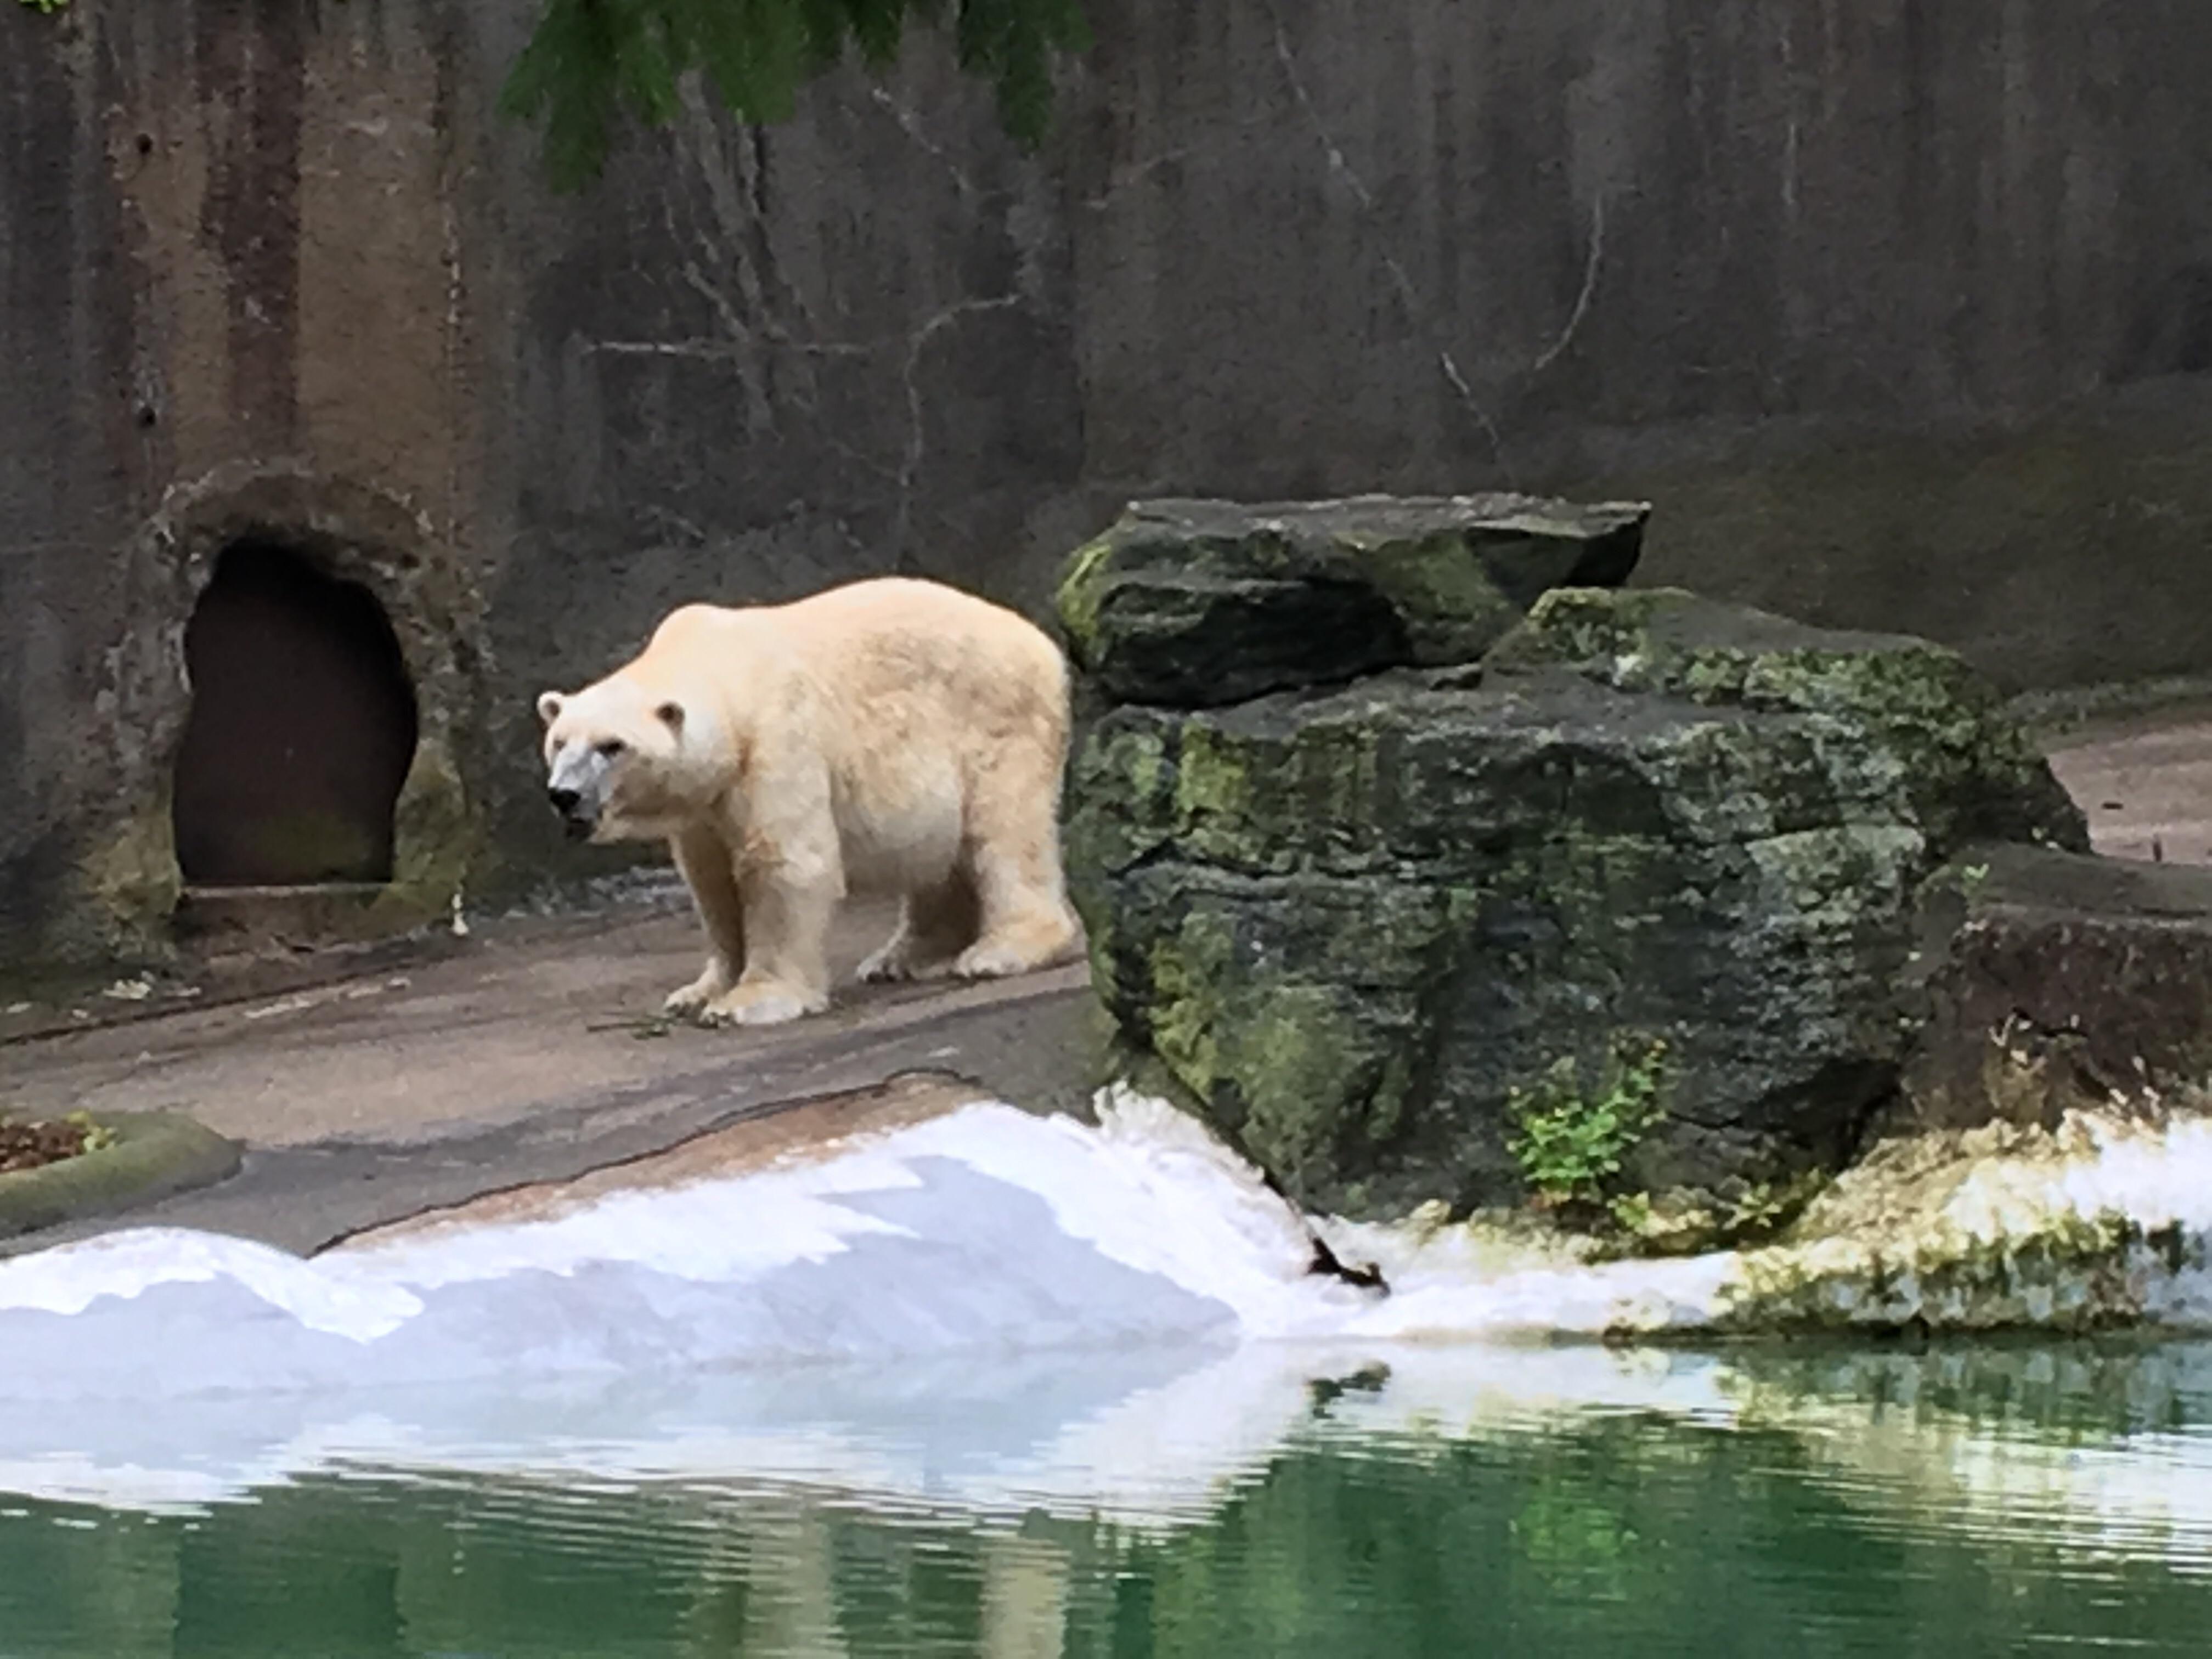 Polar Bear At Bronx Zoo Http Ift Tt 2rmviwv Bronx Zoo Polar Bear Zoo